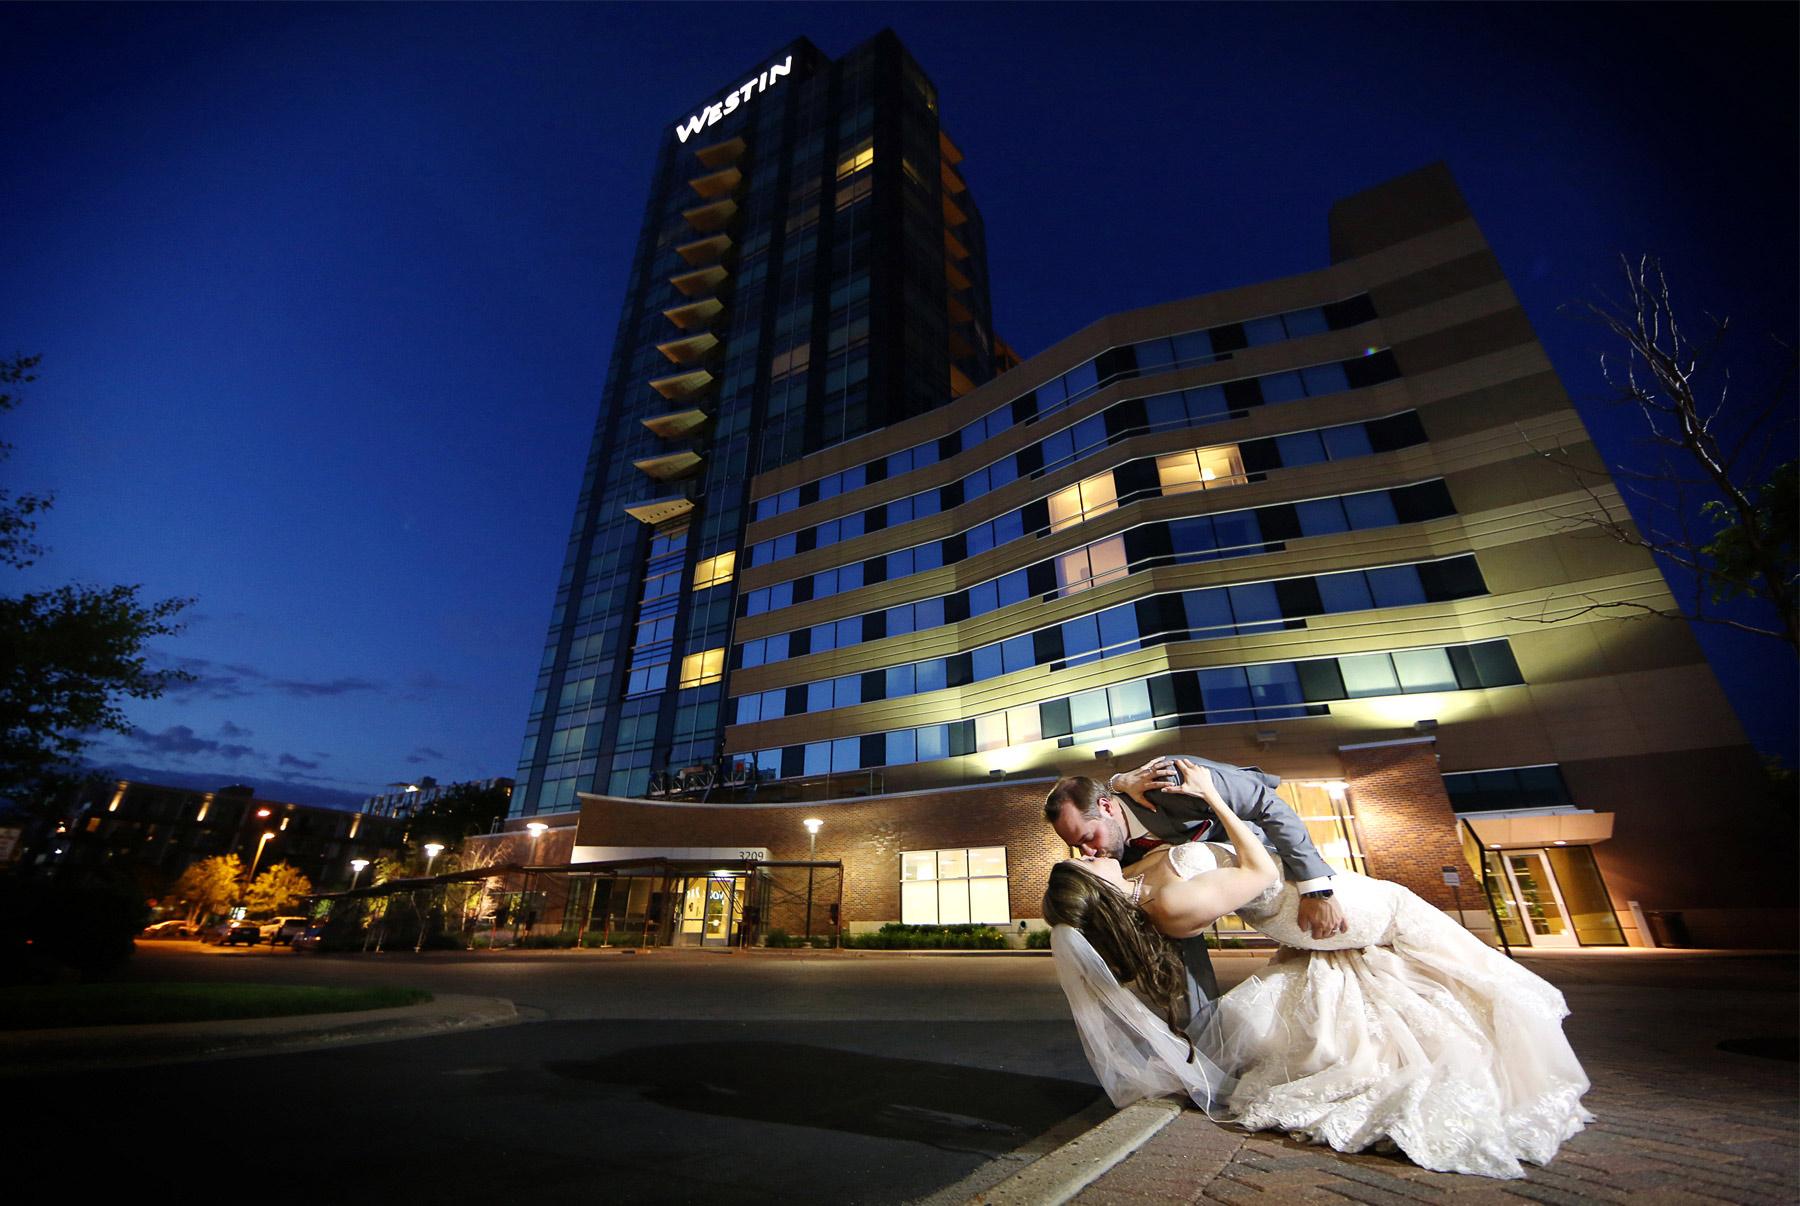 26-Minneapolis-Minnesota-Wedding-Photographer-by-Andrew-Vick-Photography-Summer-Edina-Westin-Hotel-Kiss-Dip-Embrace-Night-Outside-Bride-Groom-Natalie-and-Andrew.jpg